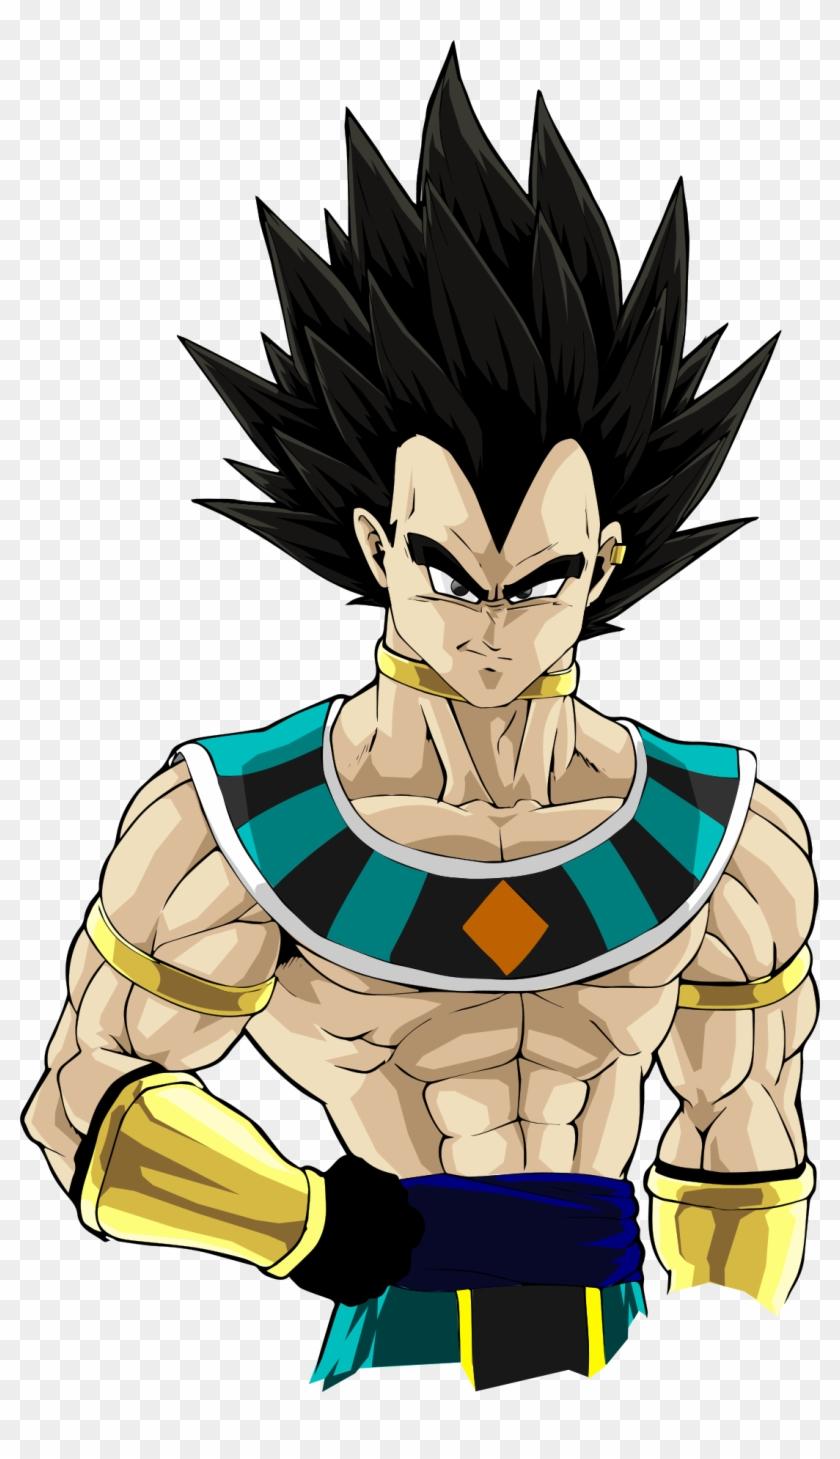 Super Saiyan Vegeta - Dbz Vegeta Hakaishin Clipart #3885622